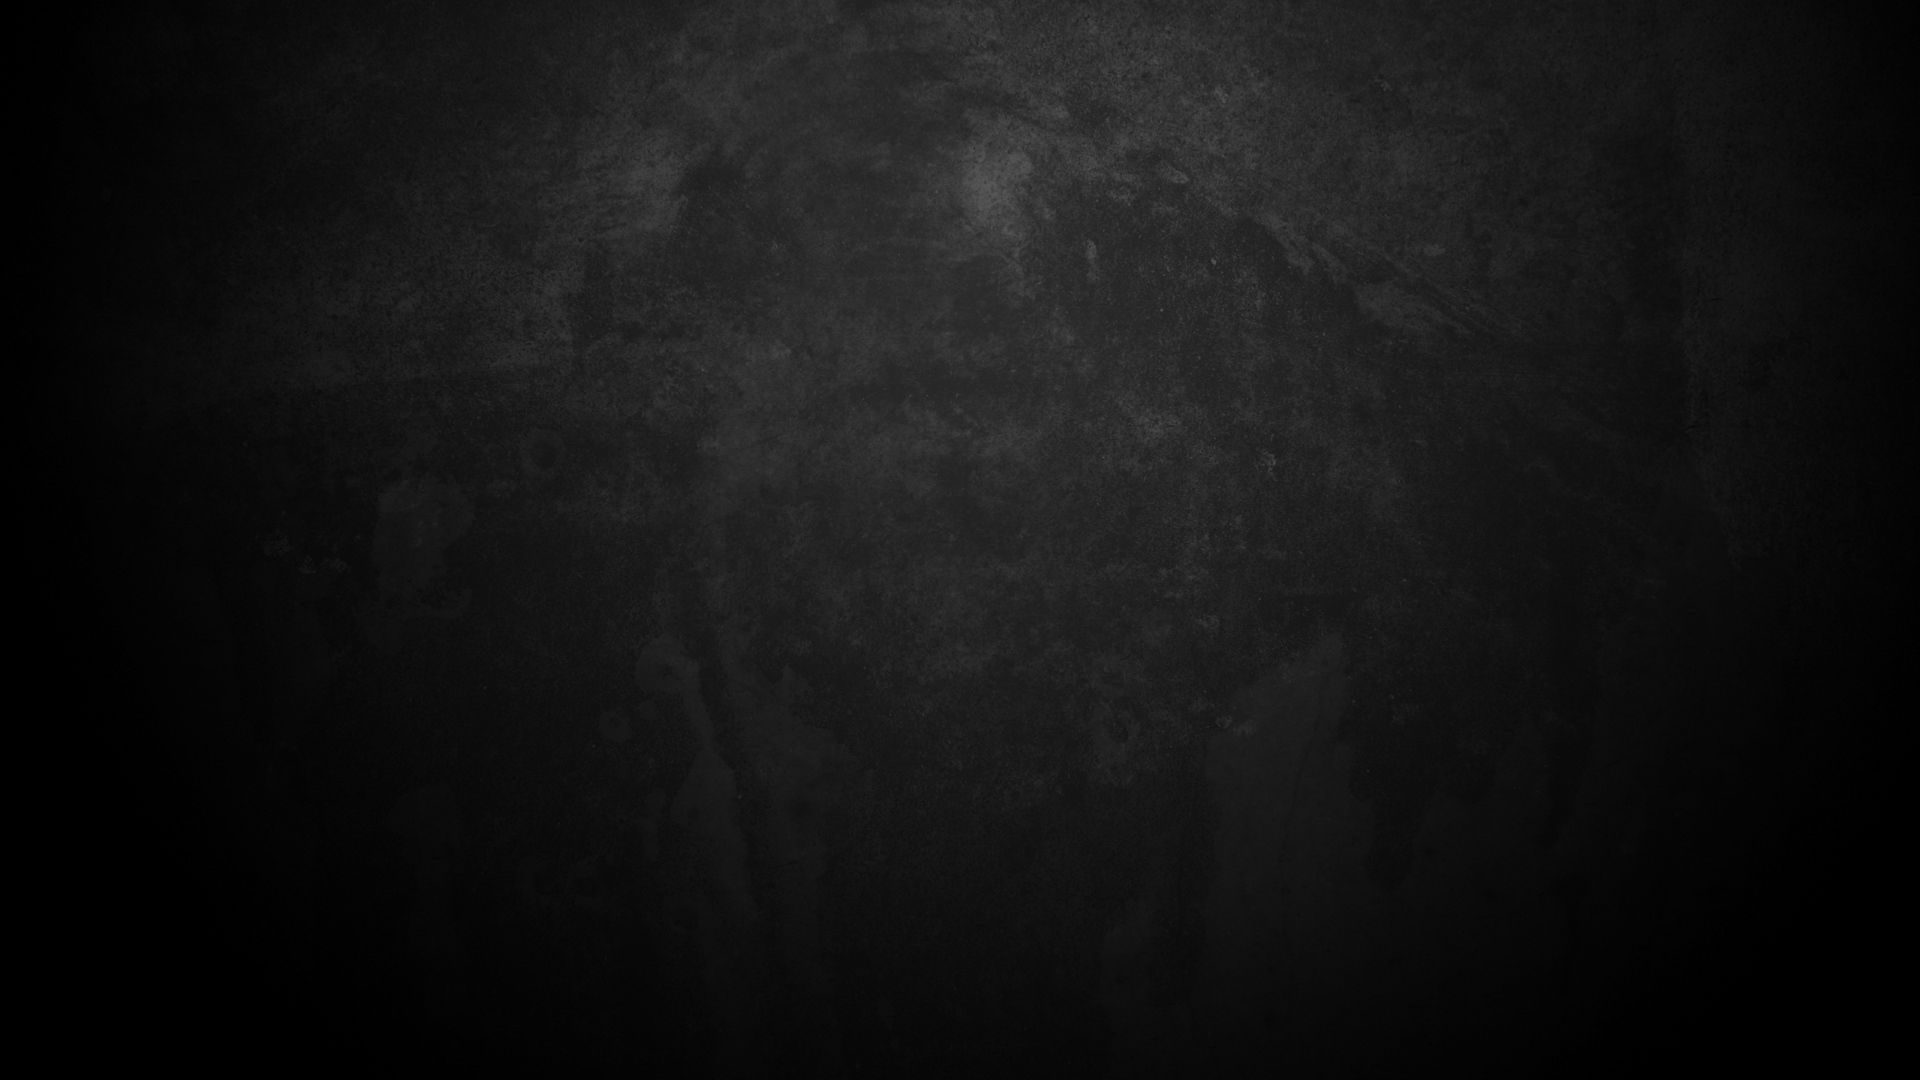 1920x1080 Wallpaper dark, spots, texture, background